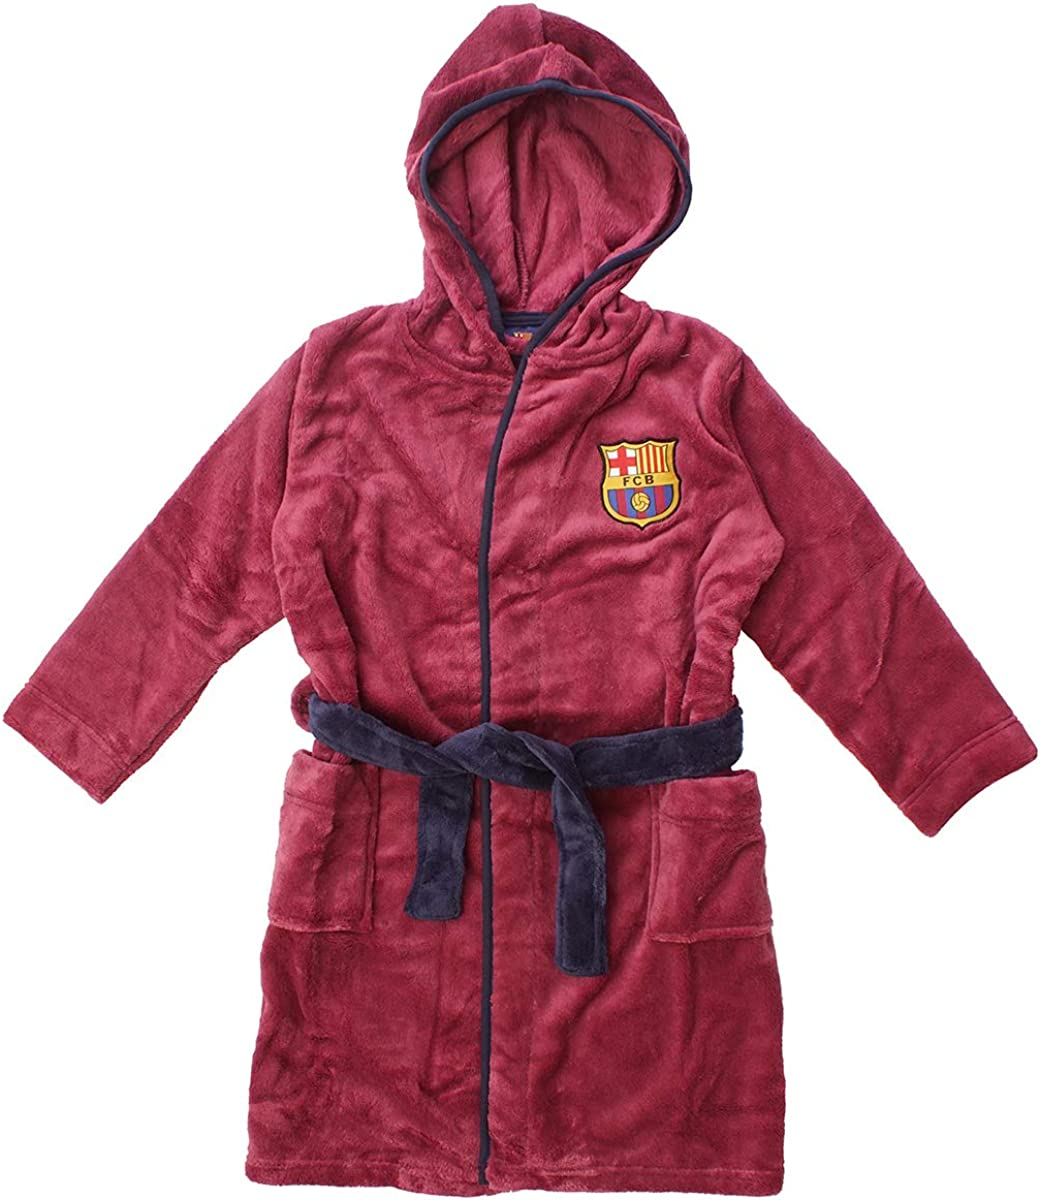 Blue Boys Official Barcelona FCB Hooded Fleece Dressing Gown Bathrobe 7-8 Years